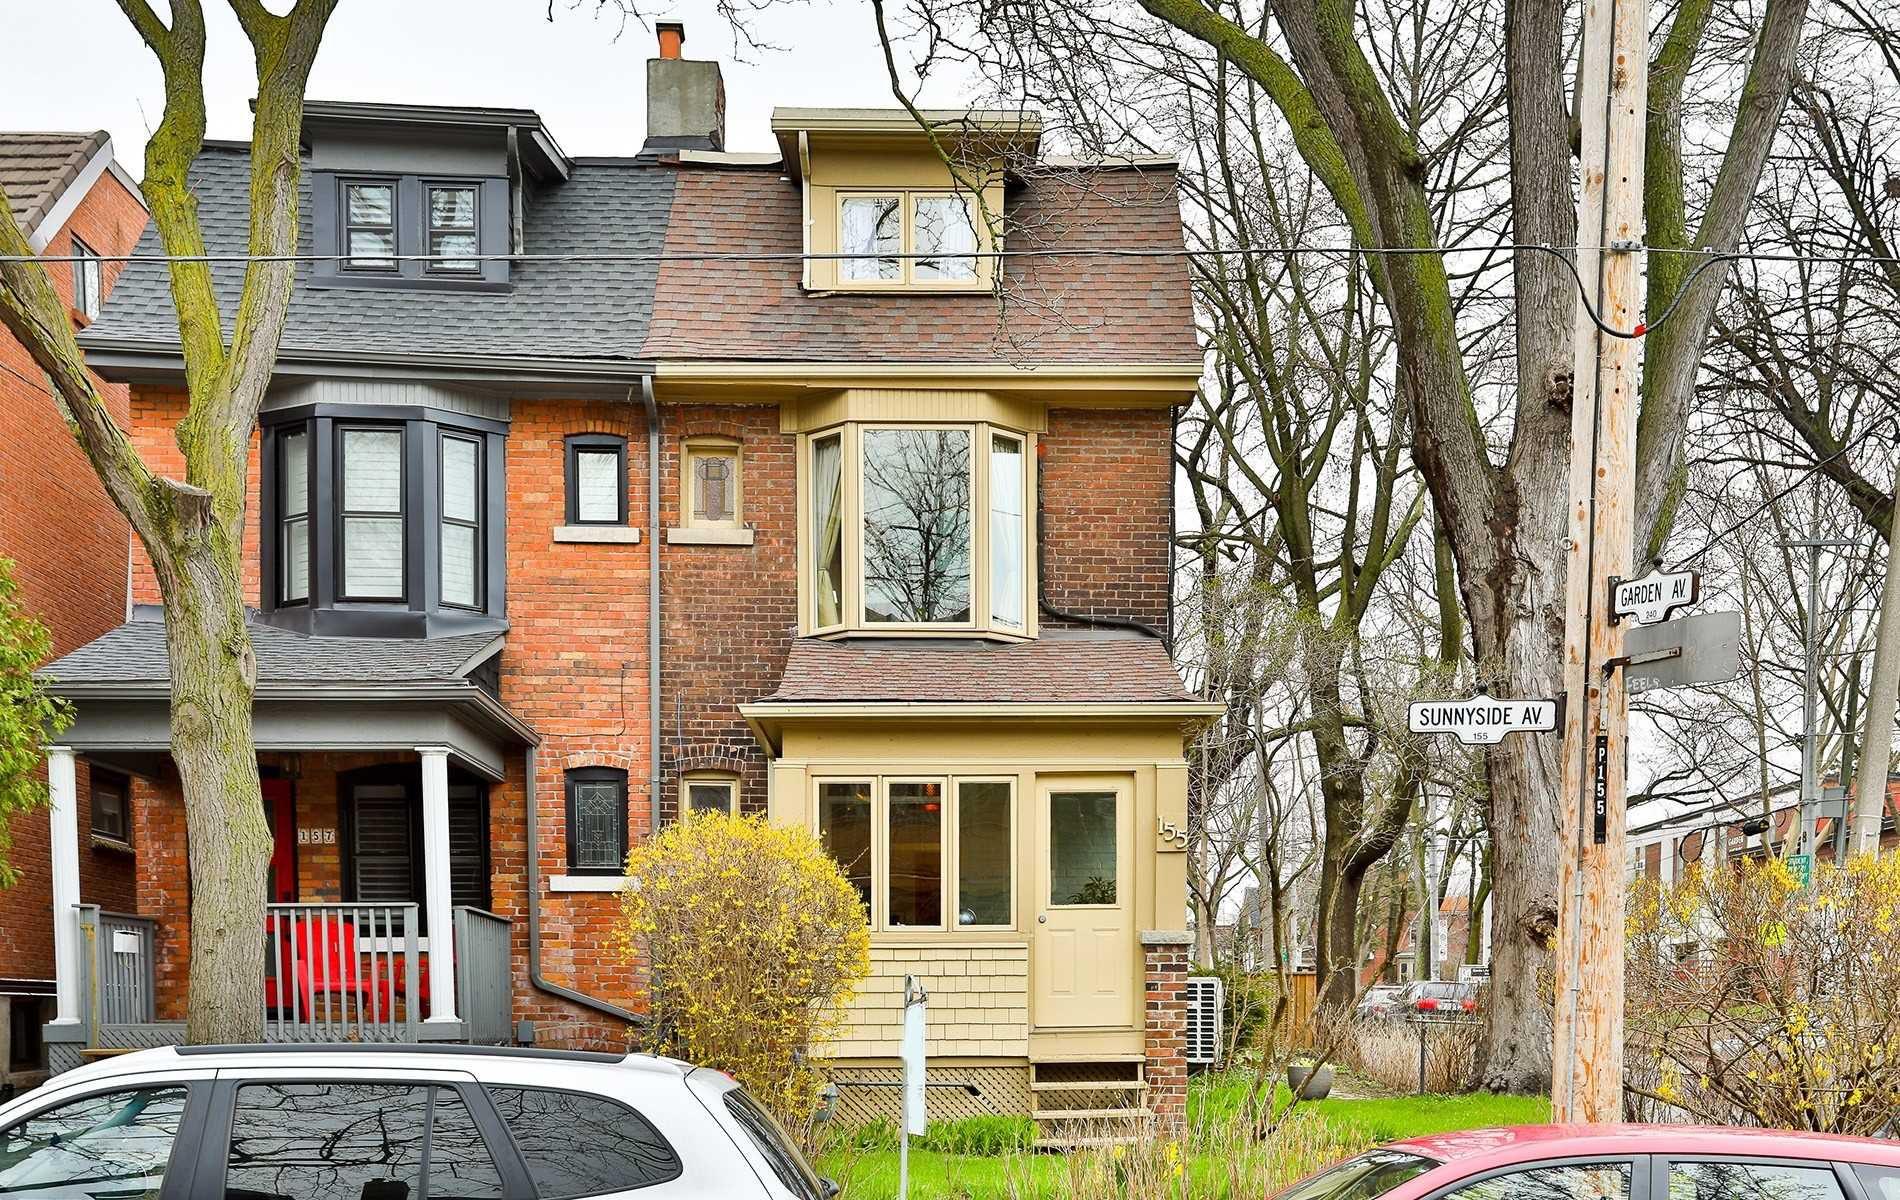 Main Photo: 155 Sunnyside Avenue in Toronto: High Park-Swansea House (2 1/2 Storey) for sale (Toronto W01)  : MLS®# W4440904